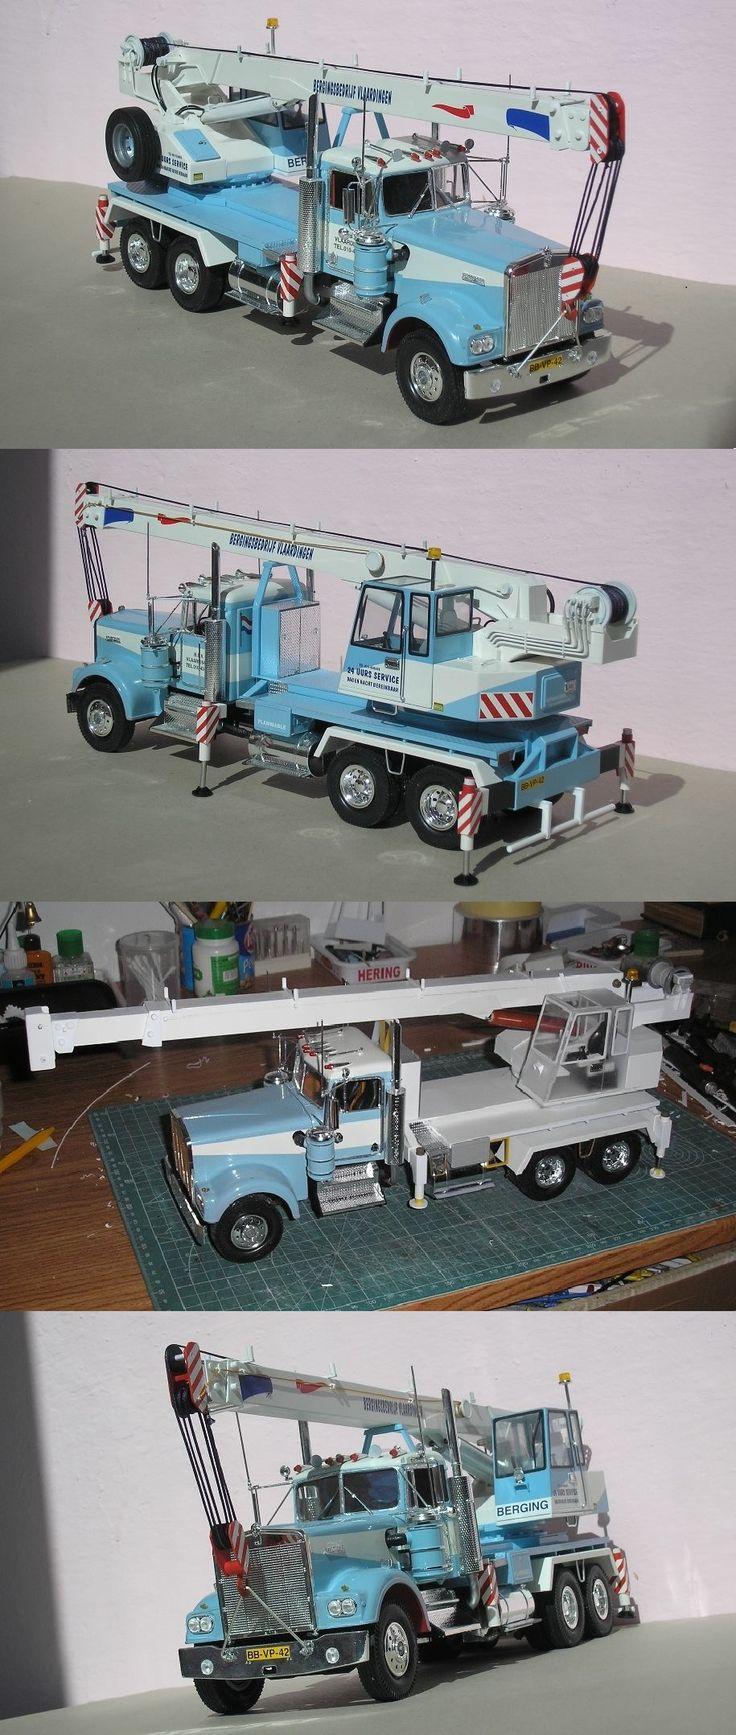 Model car model kits scale models metal models diorama ideas model building dioramas modeling hobbies